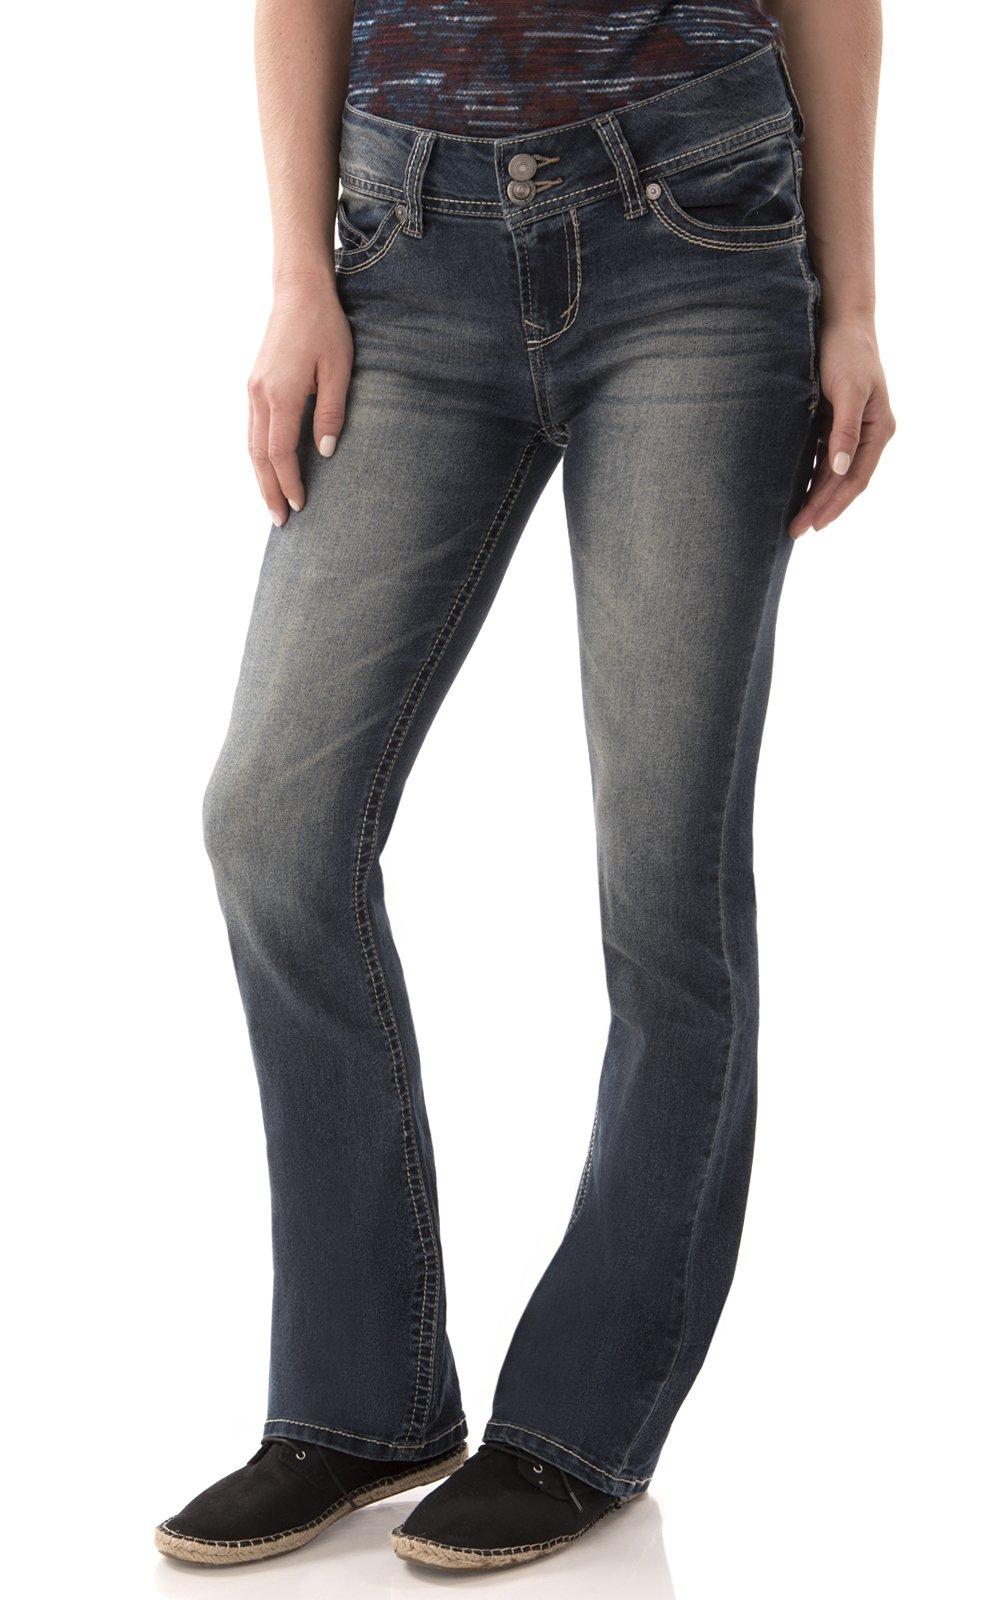 WallFlower Juniors Luscious Curvy Short Inseam Basic Bootcut Jeans in Katy Size:0 Short